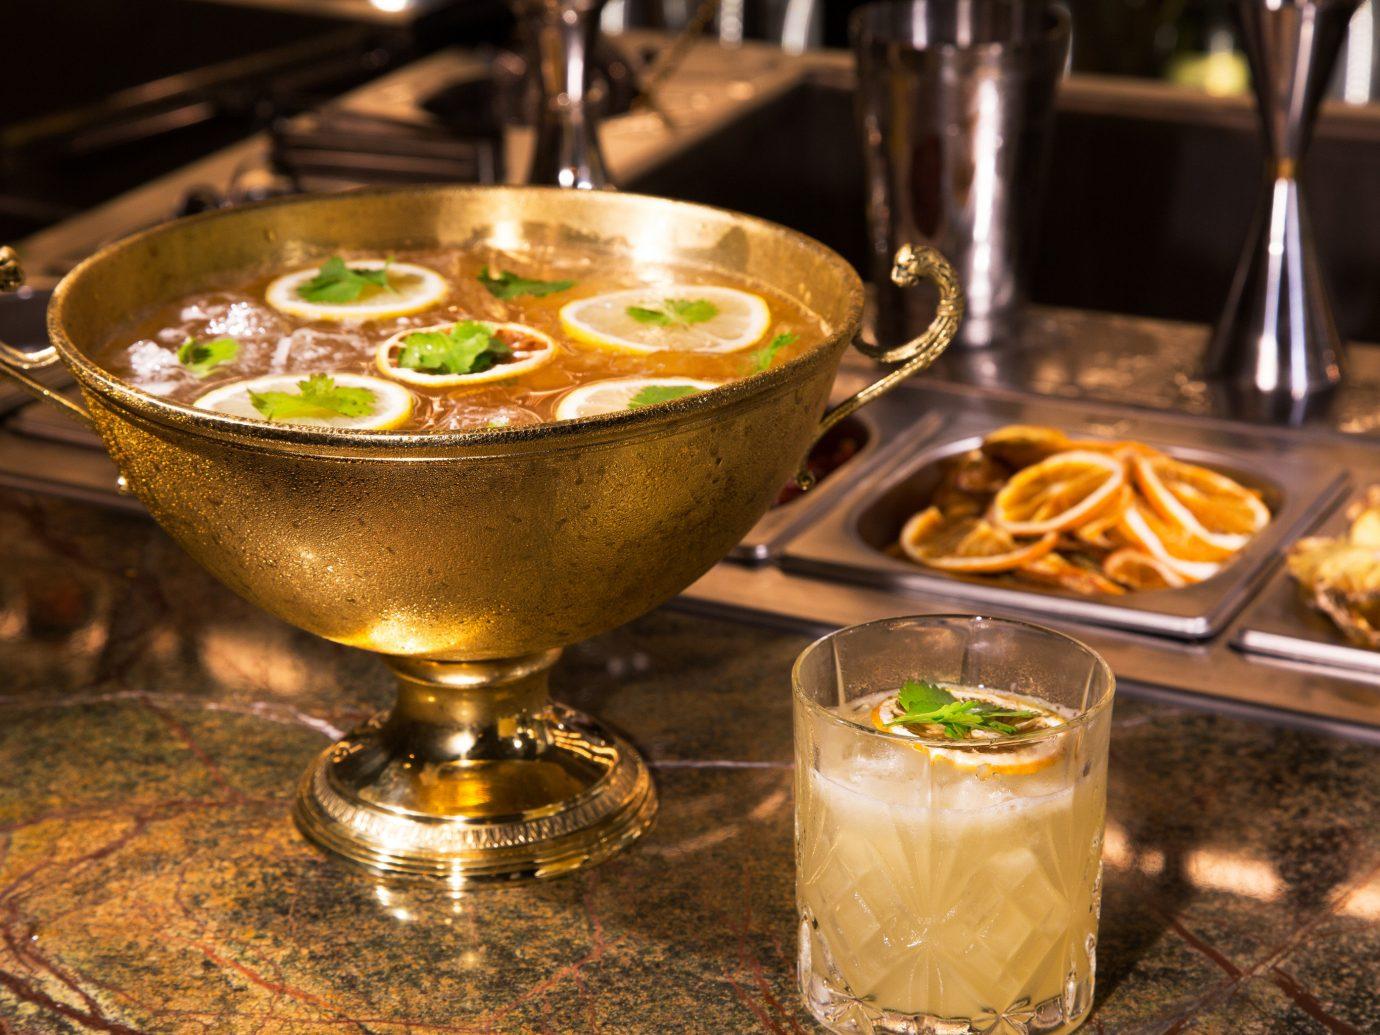 Food + Drink Luxury Travel News Style + Design Trip Ideas indoor dish food Drink cuisine meal vegetarian food appetizer asian food pan soup